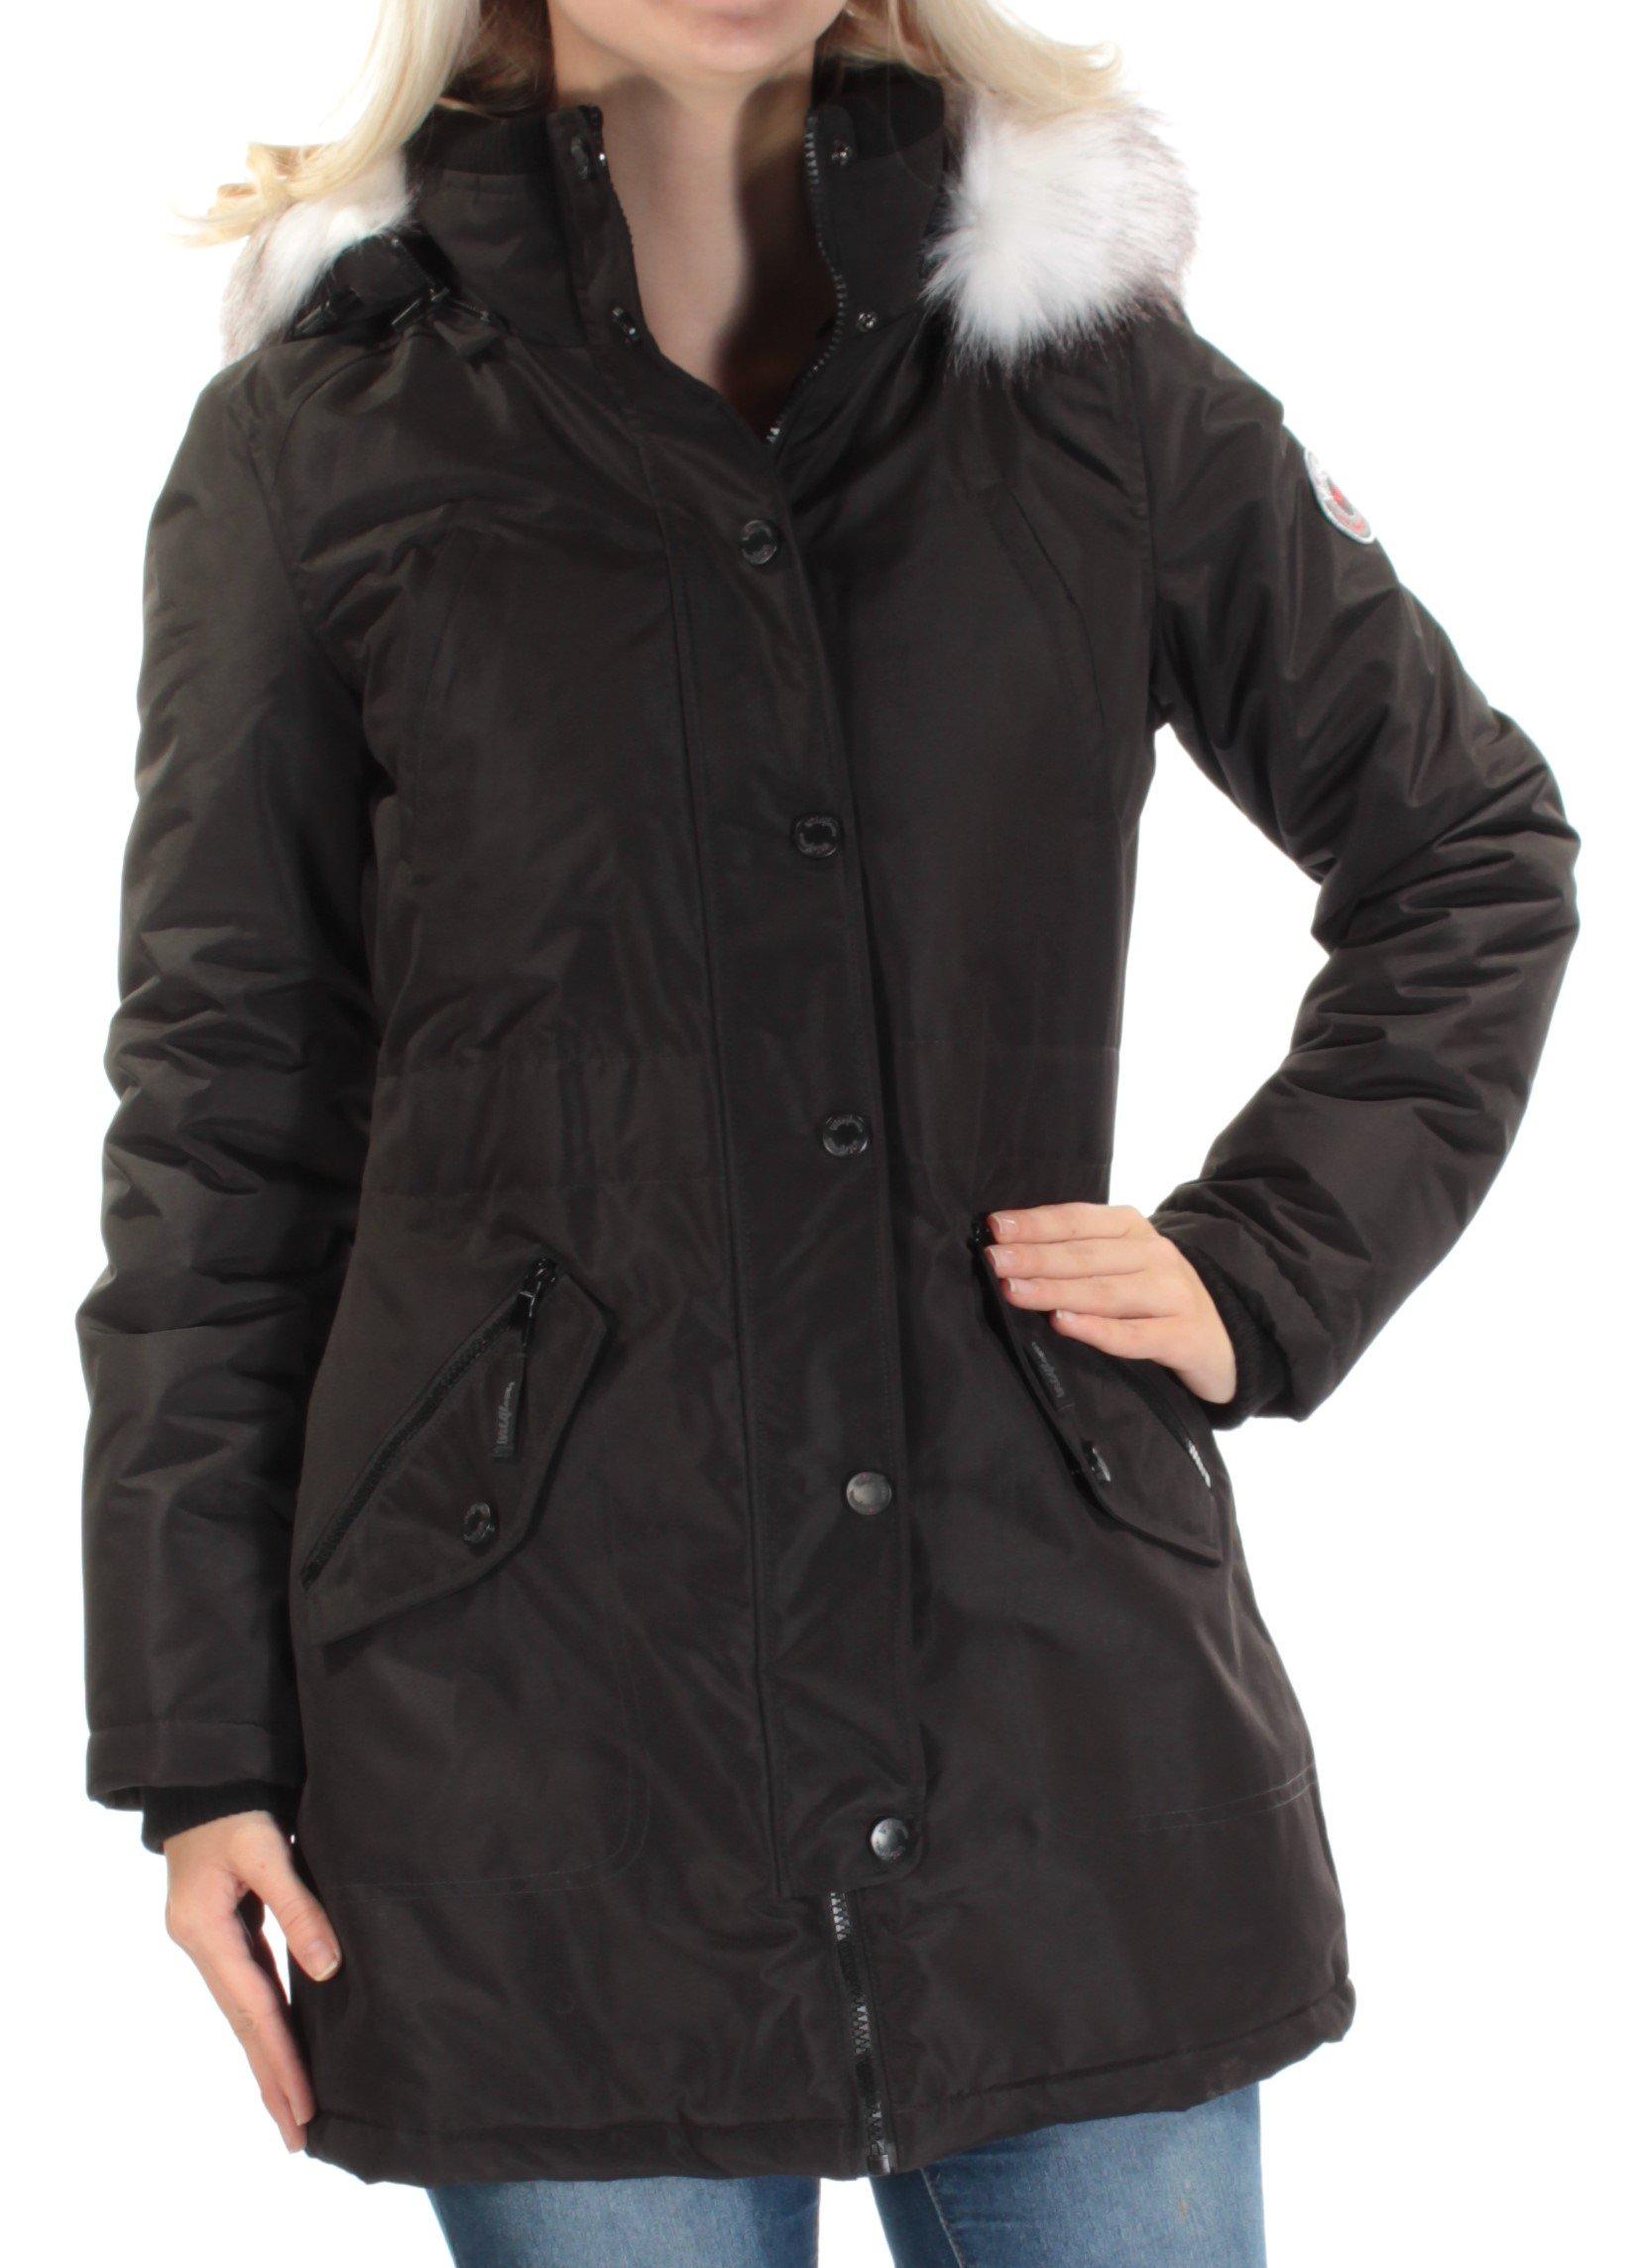 Wild Flower Womens Faux Fur Long Sleeves Puffer Coat Black XS